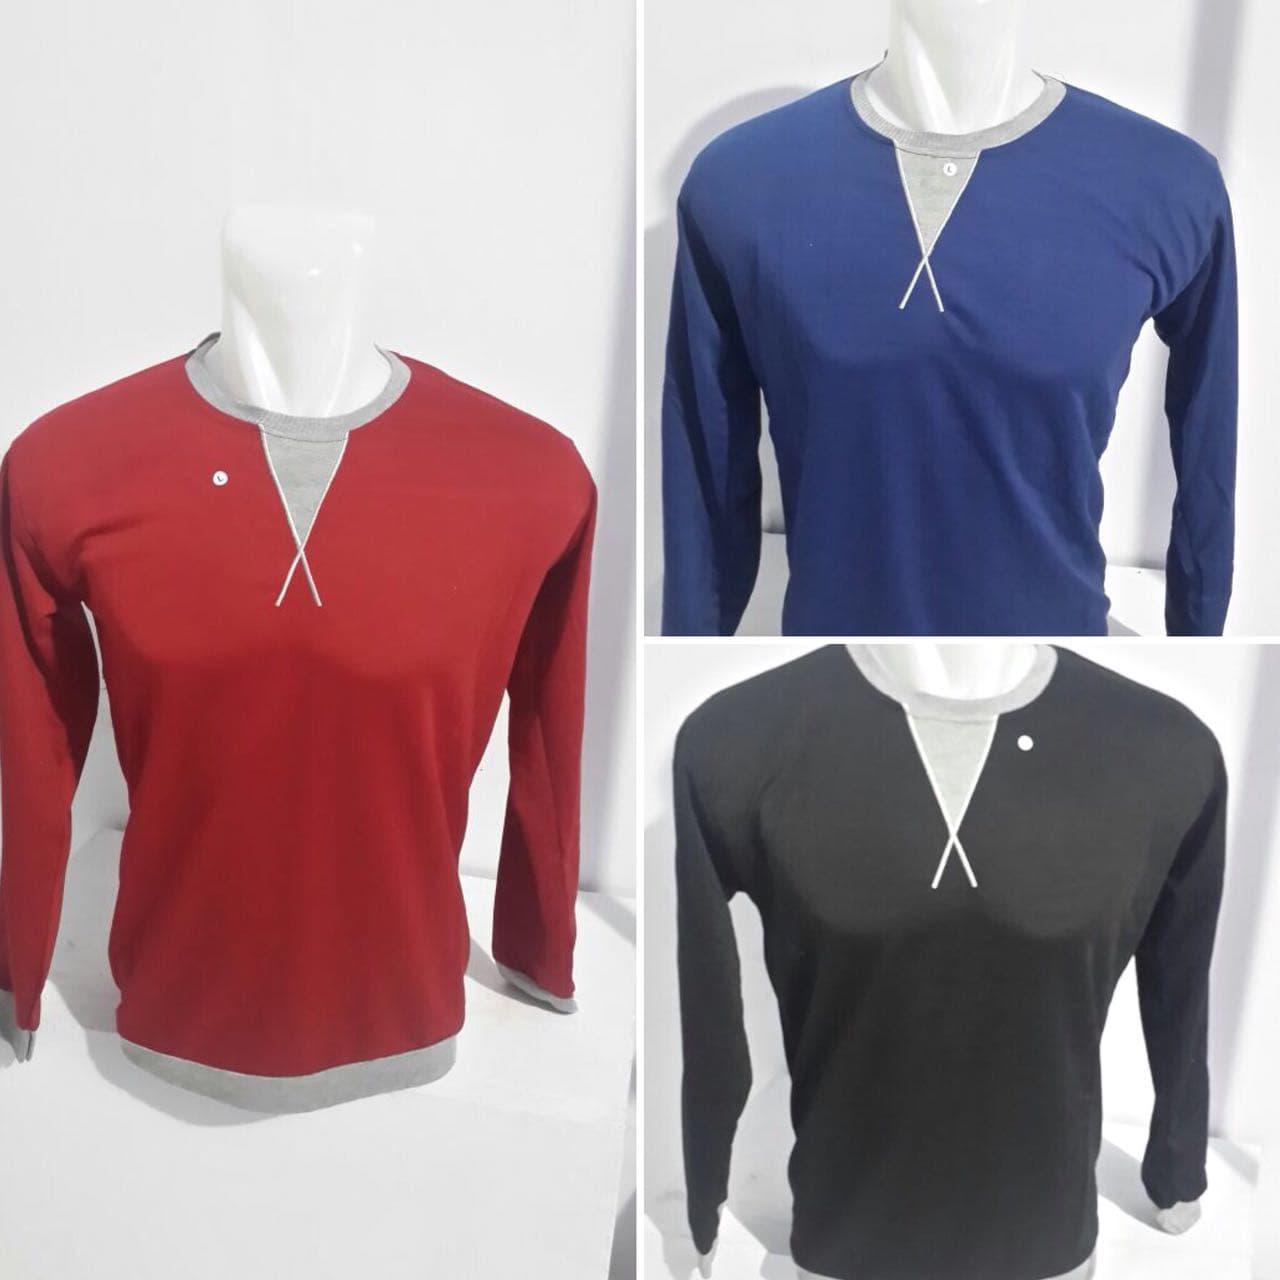 Jual Kaos Polos Bordir Krah Kombinasi Lengan Panjang Hitam Katun Produk Ukm Bumn Tas Phiton Coklat Krem M Blanja